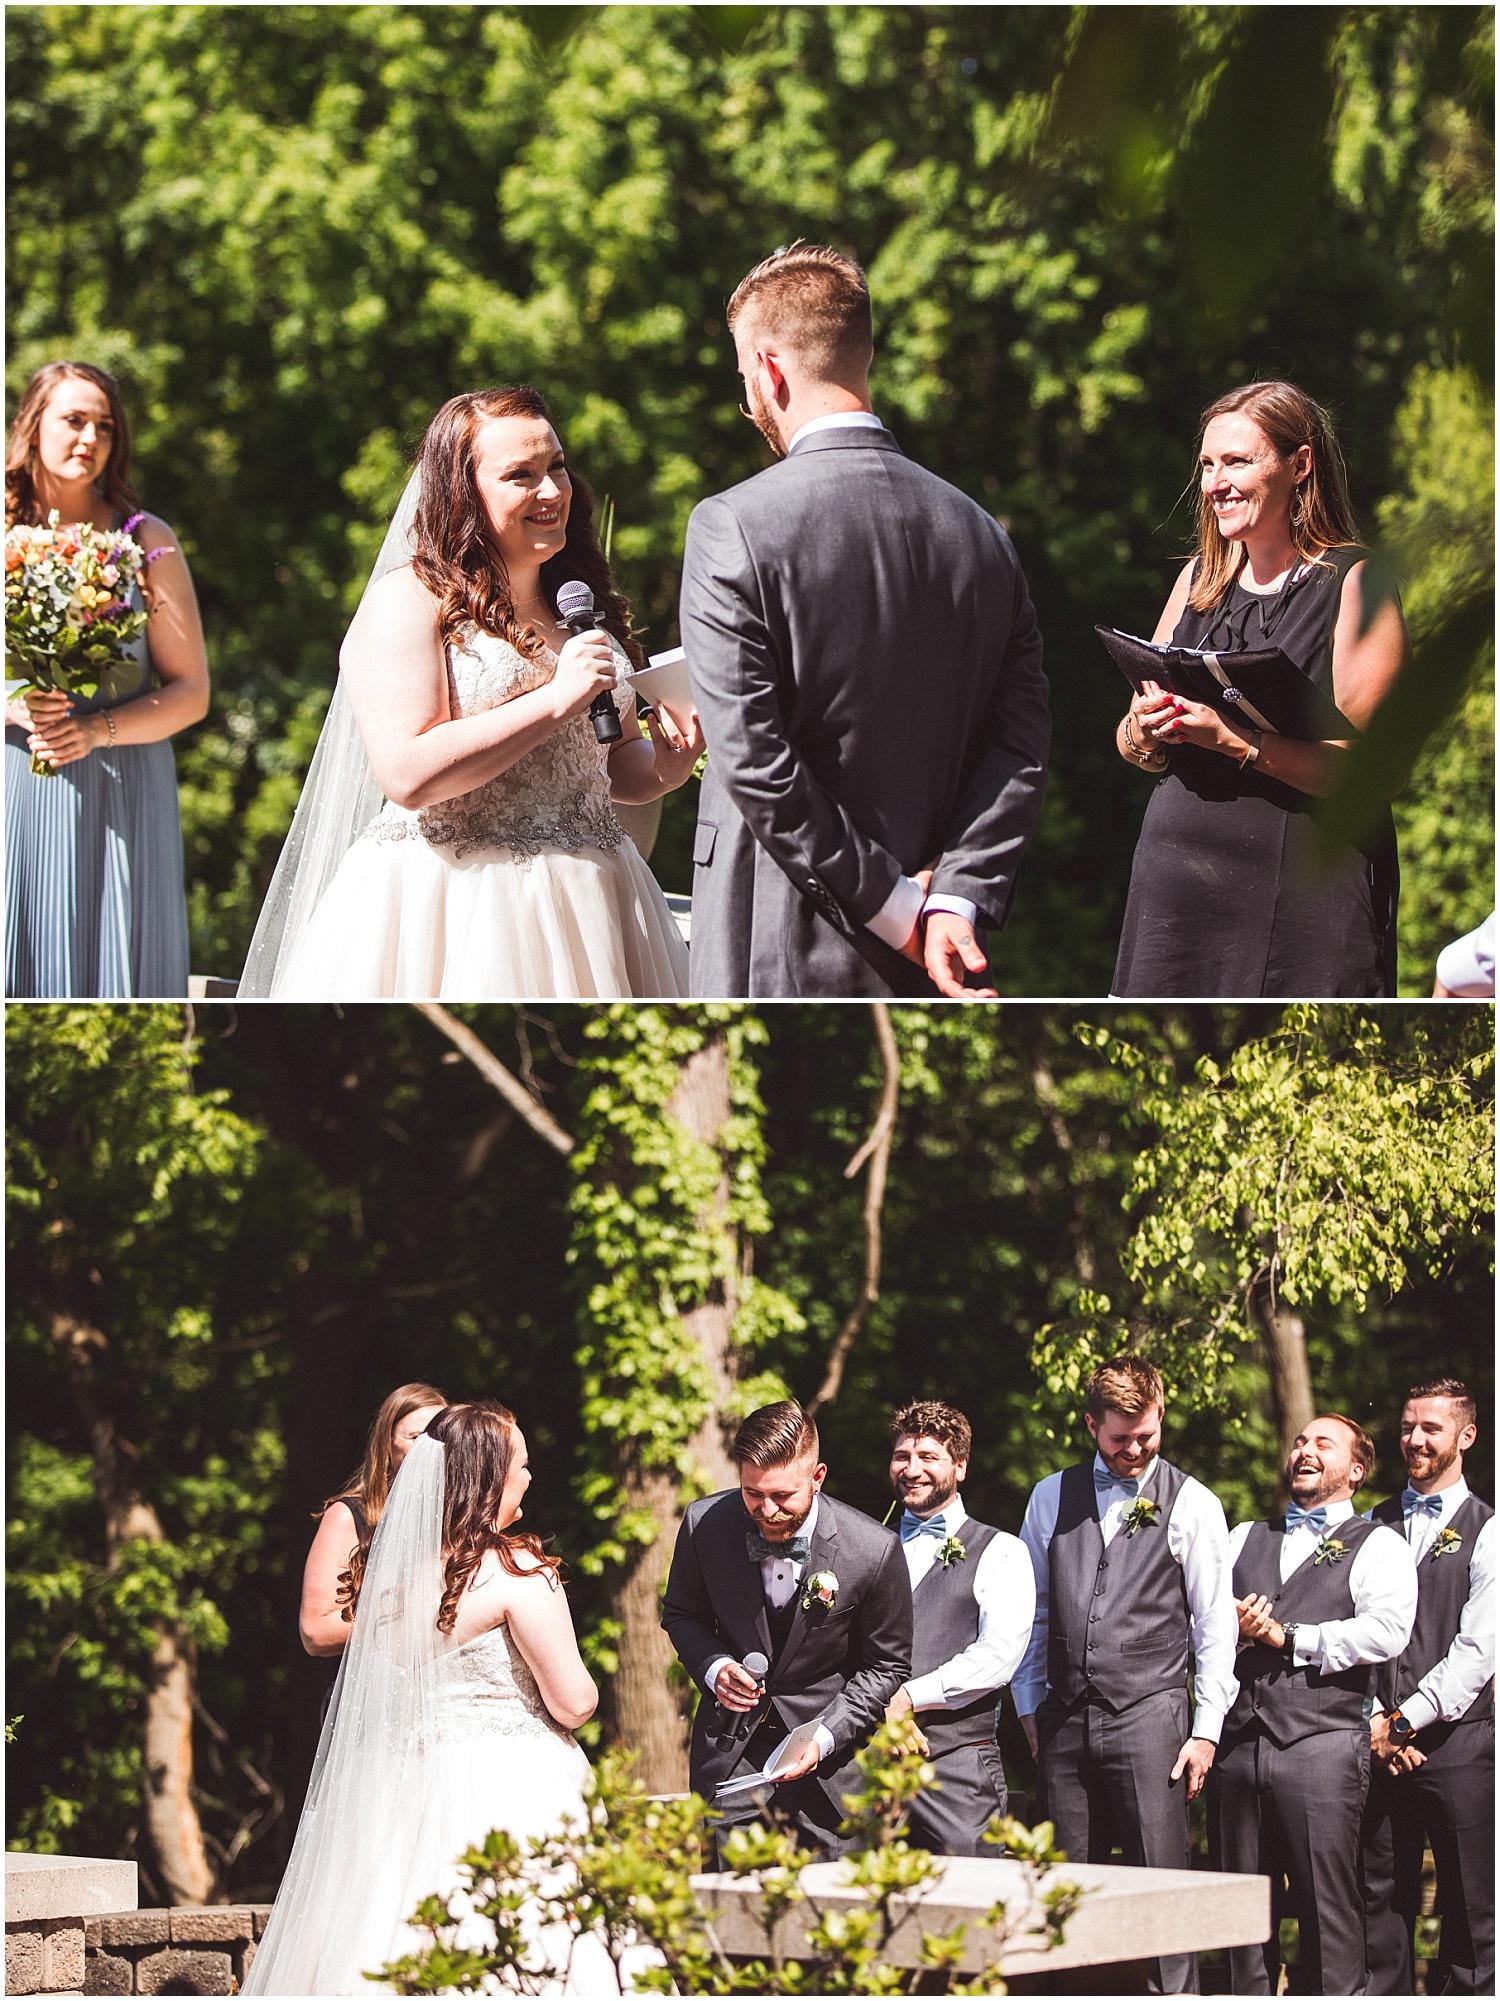 durand+eastman+clubhouse+wedding+megan+antalek (194).jpg